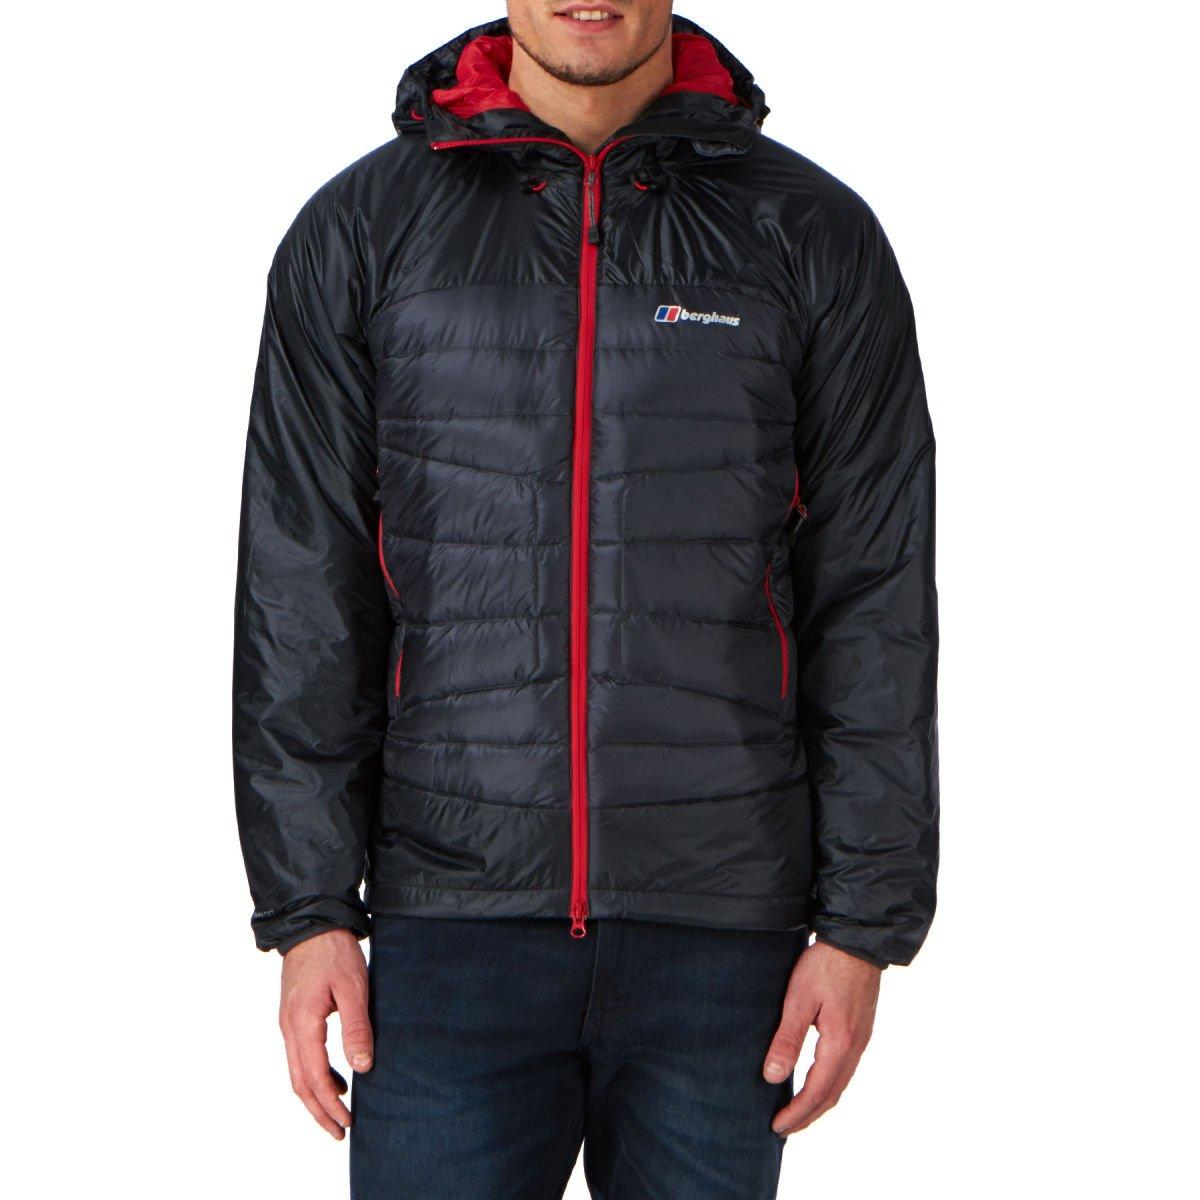 Berghaus Asgard Hybrid Jacket Men – Daunenjacke online kaufen